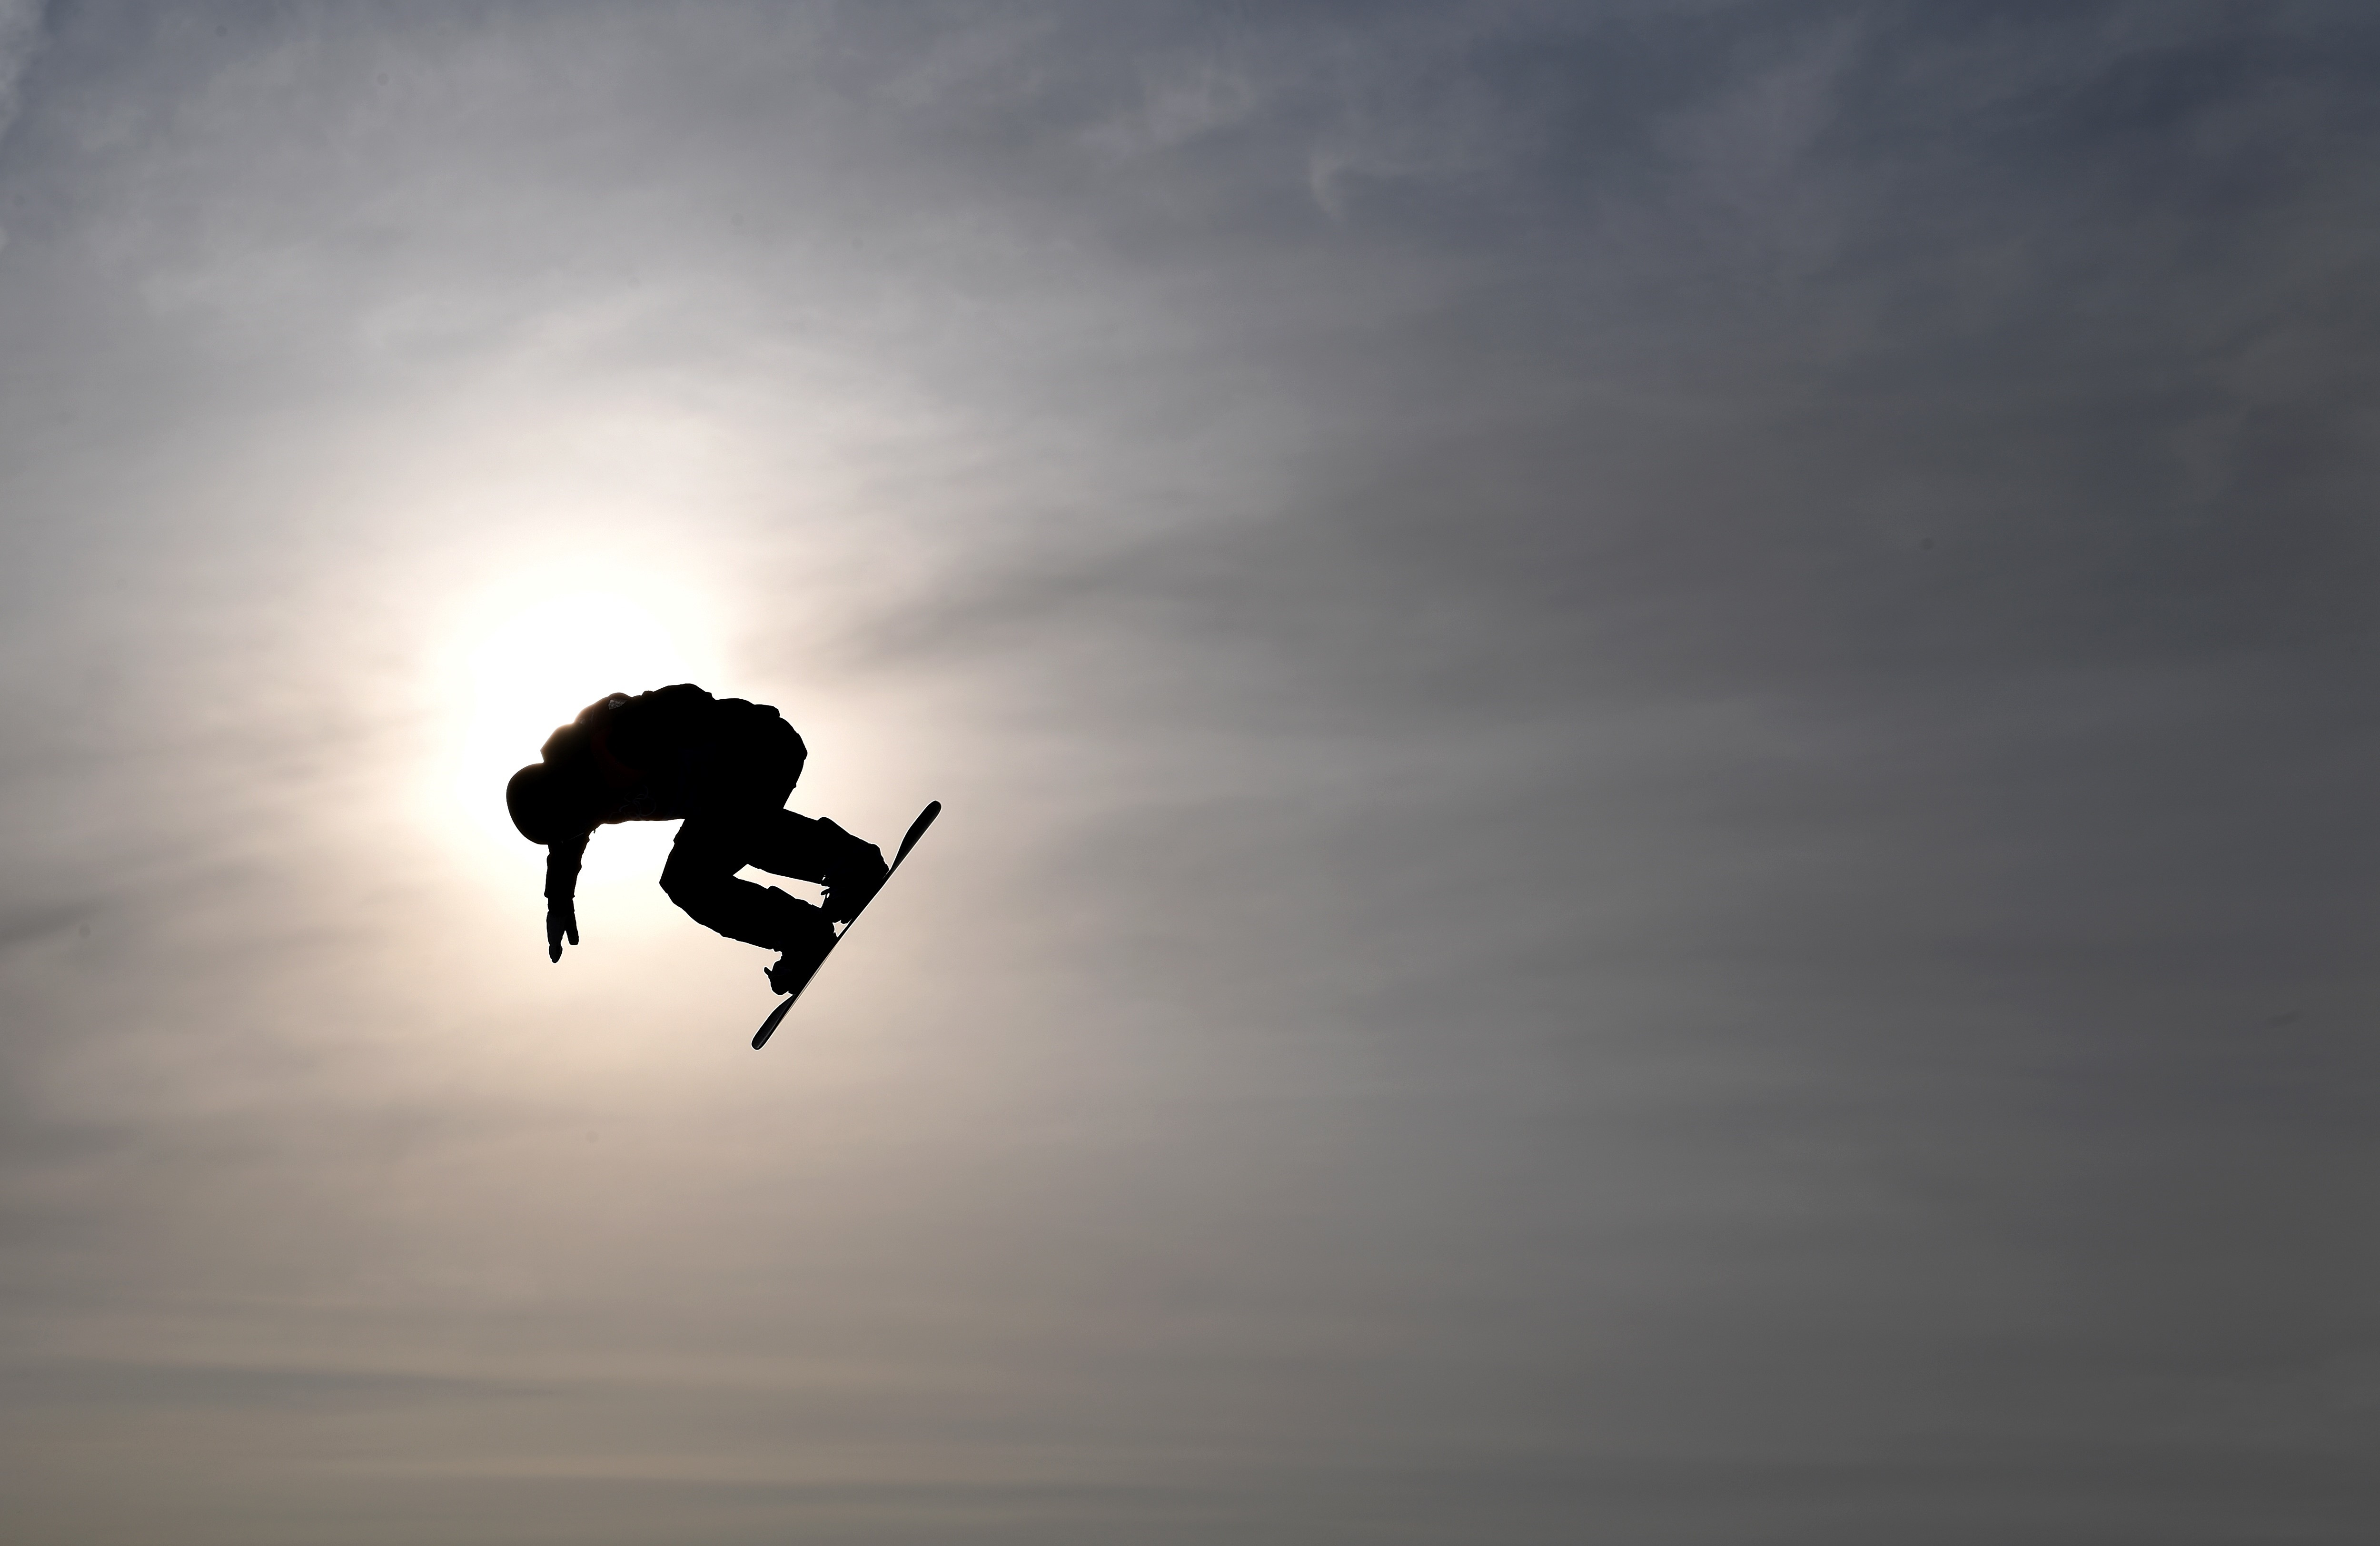 L'épreuve de BigAir aux JO de Pyeongchang